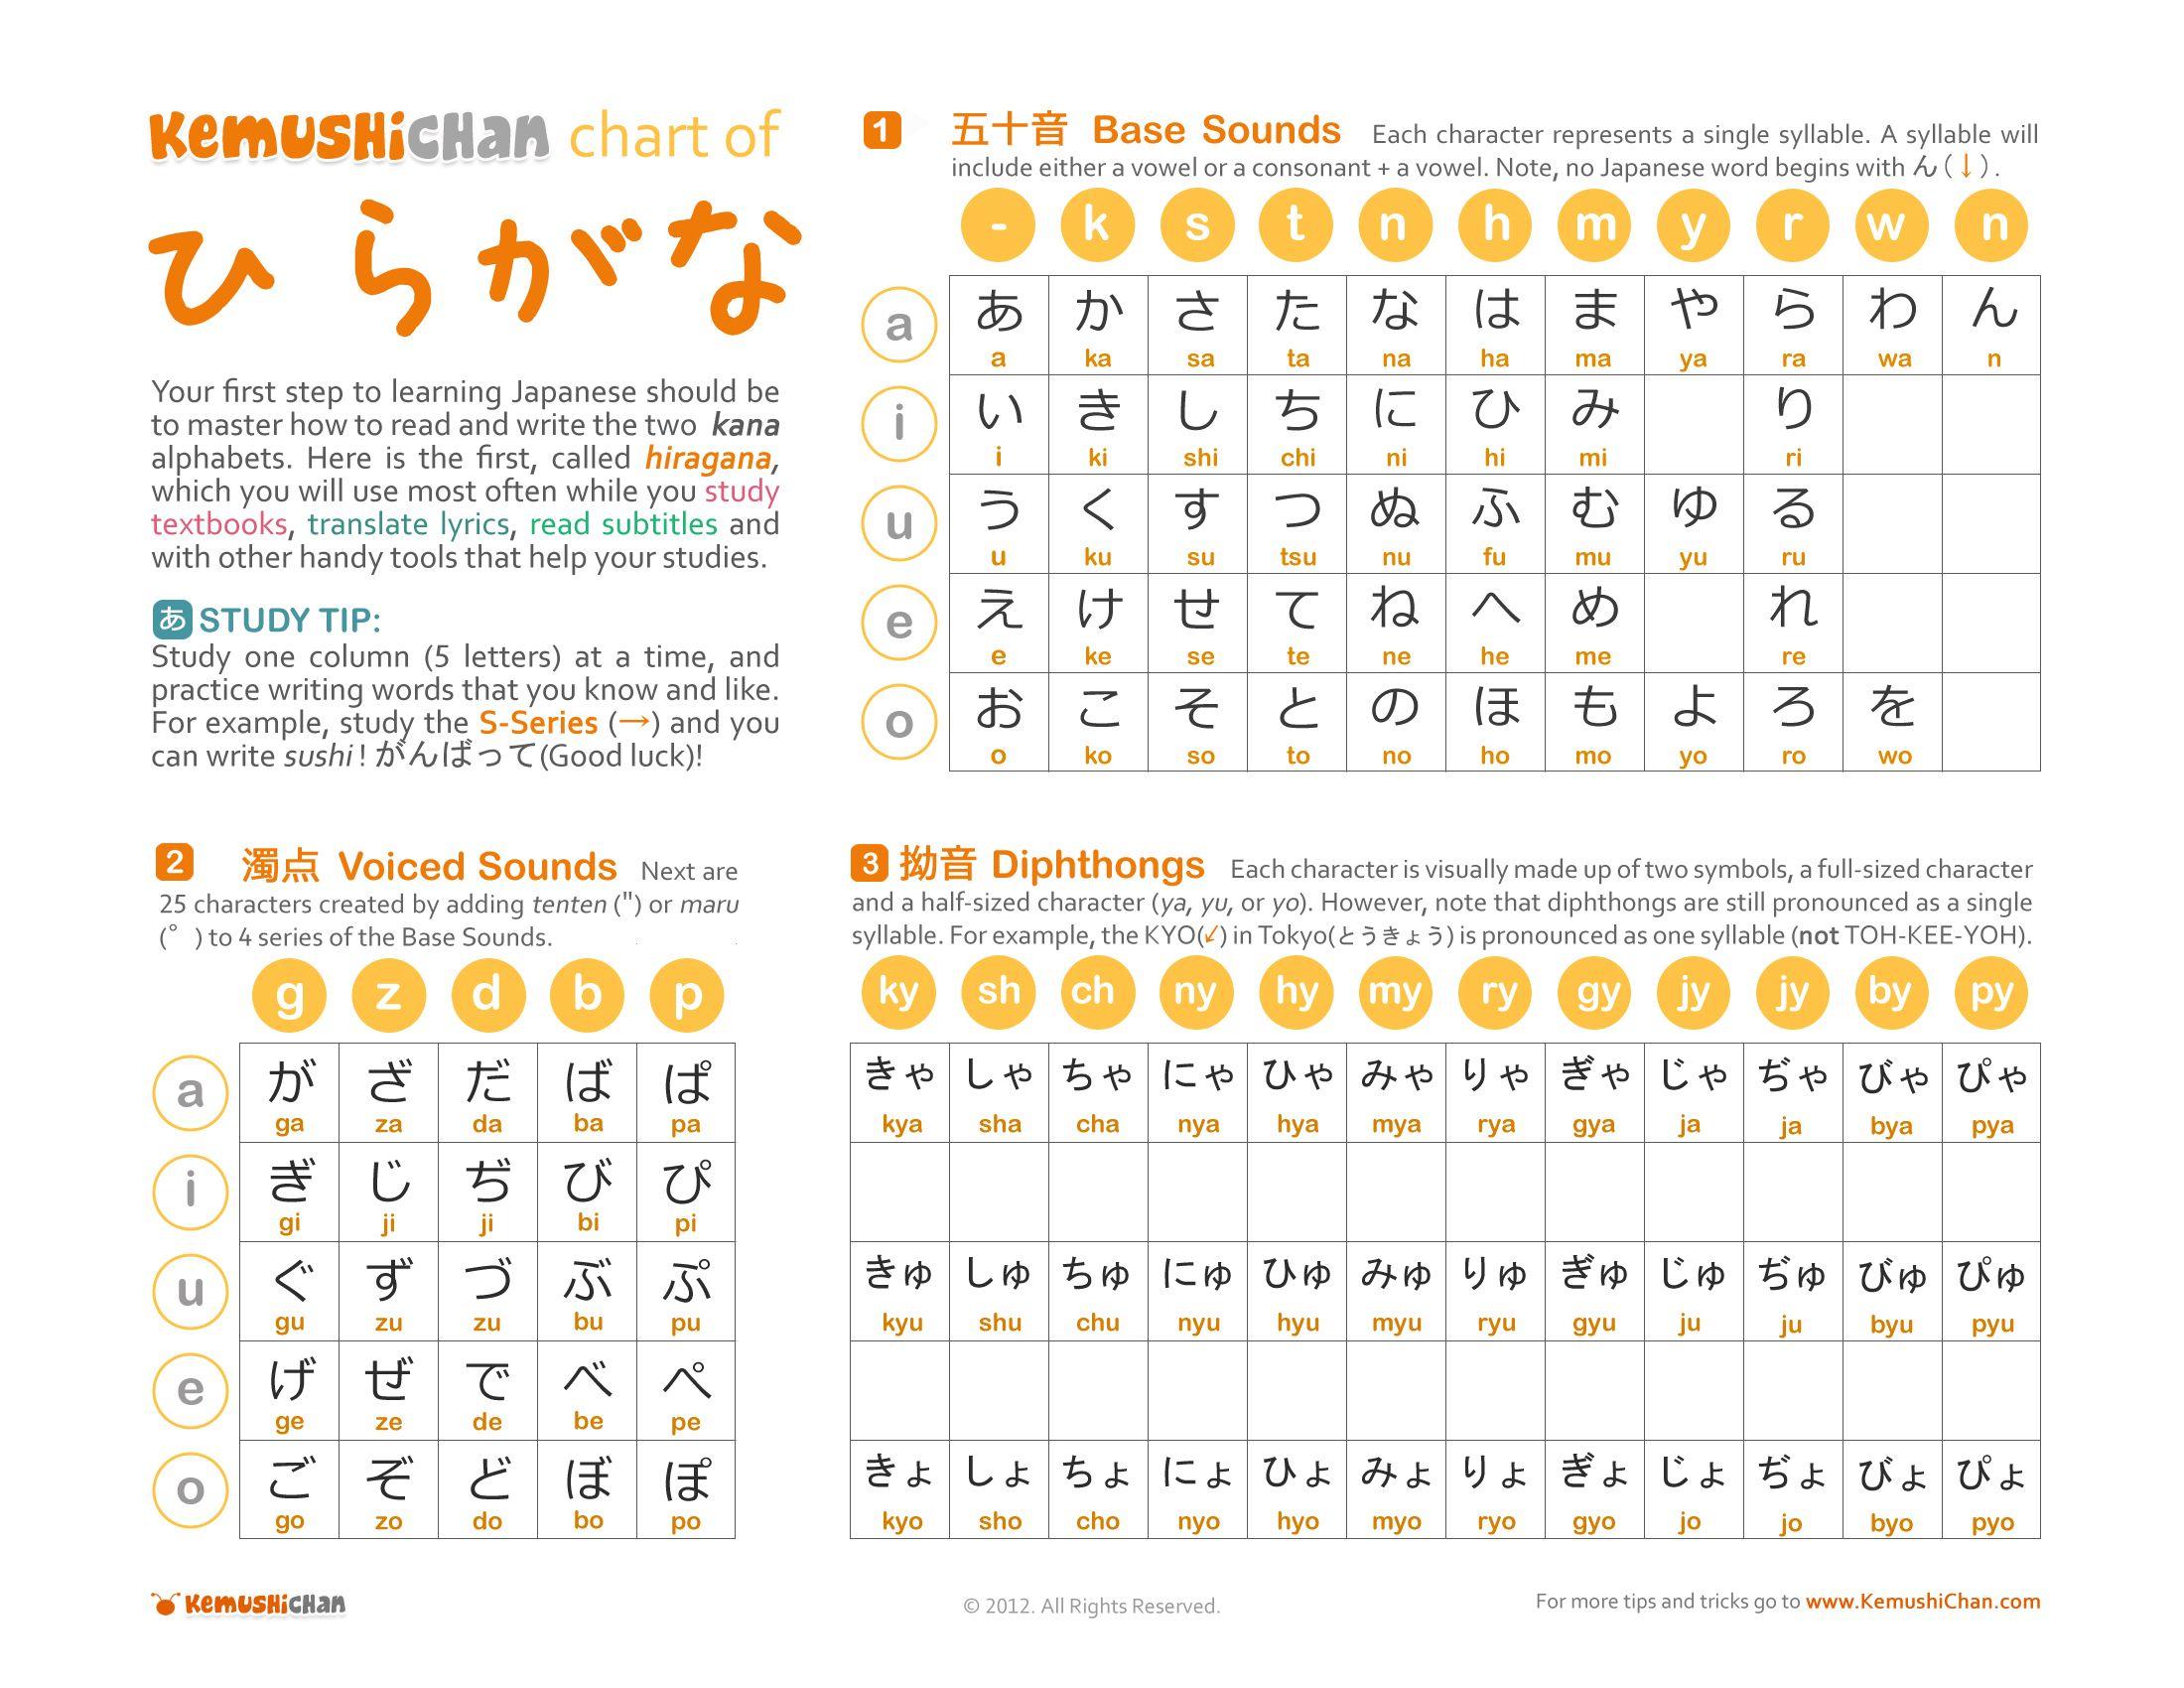 1st Step To Japanese Hiragana Chart Kemushichan Com Vowel Chart Hiragana Hiragana Chart How to read japanese in english